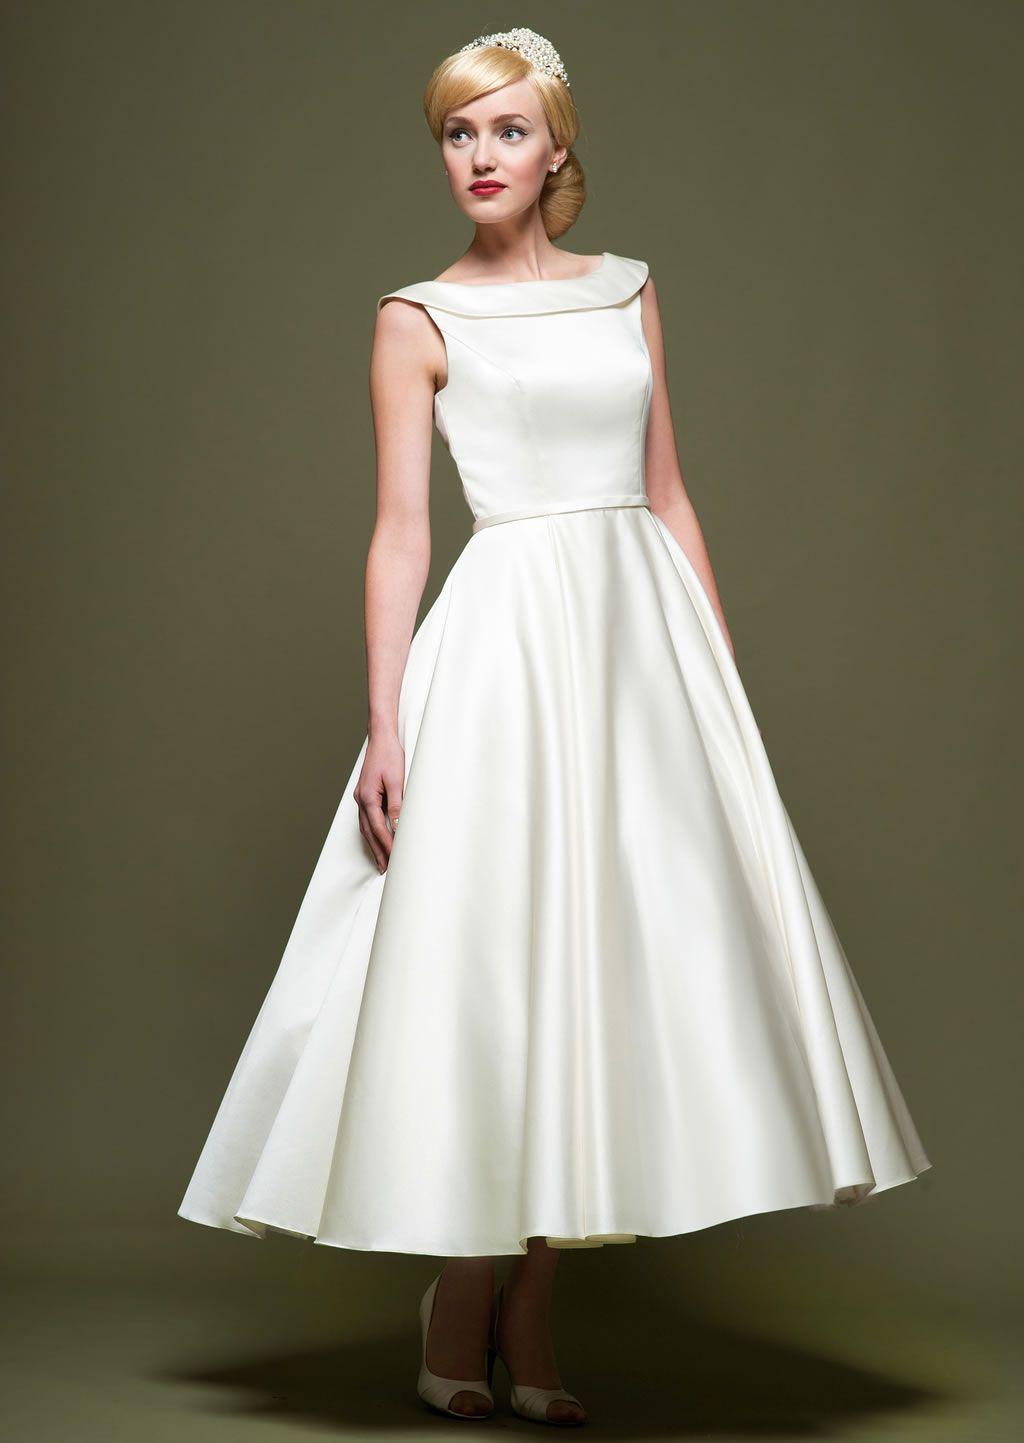 Lou Lou Bridal | wedding | Pinterest | Wedding dress, Weddings and ...